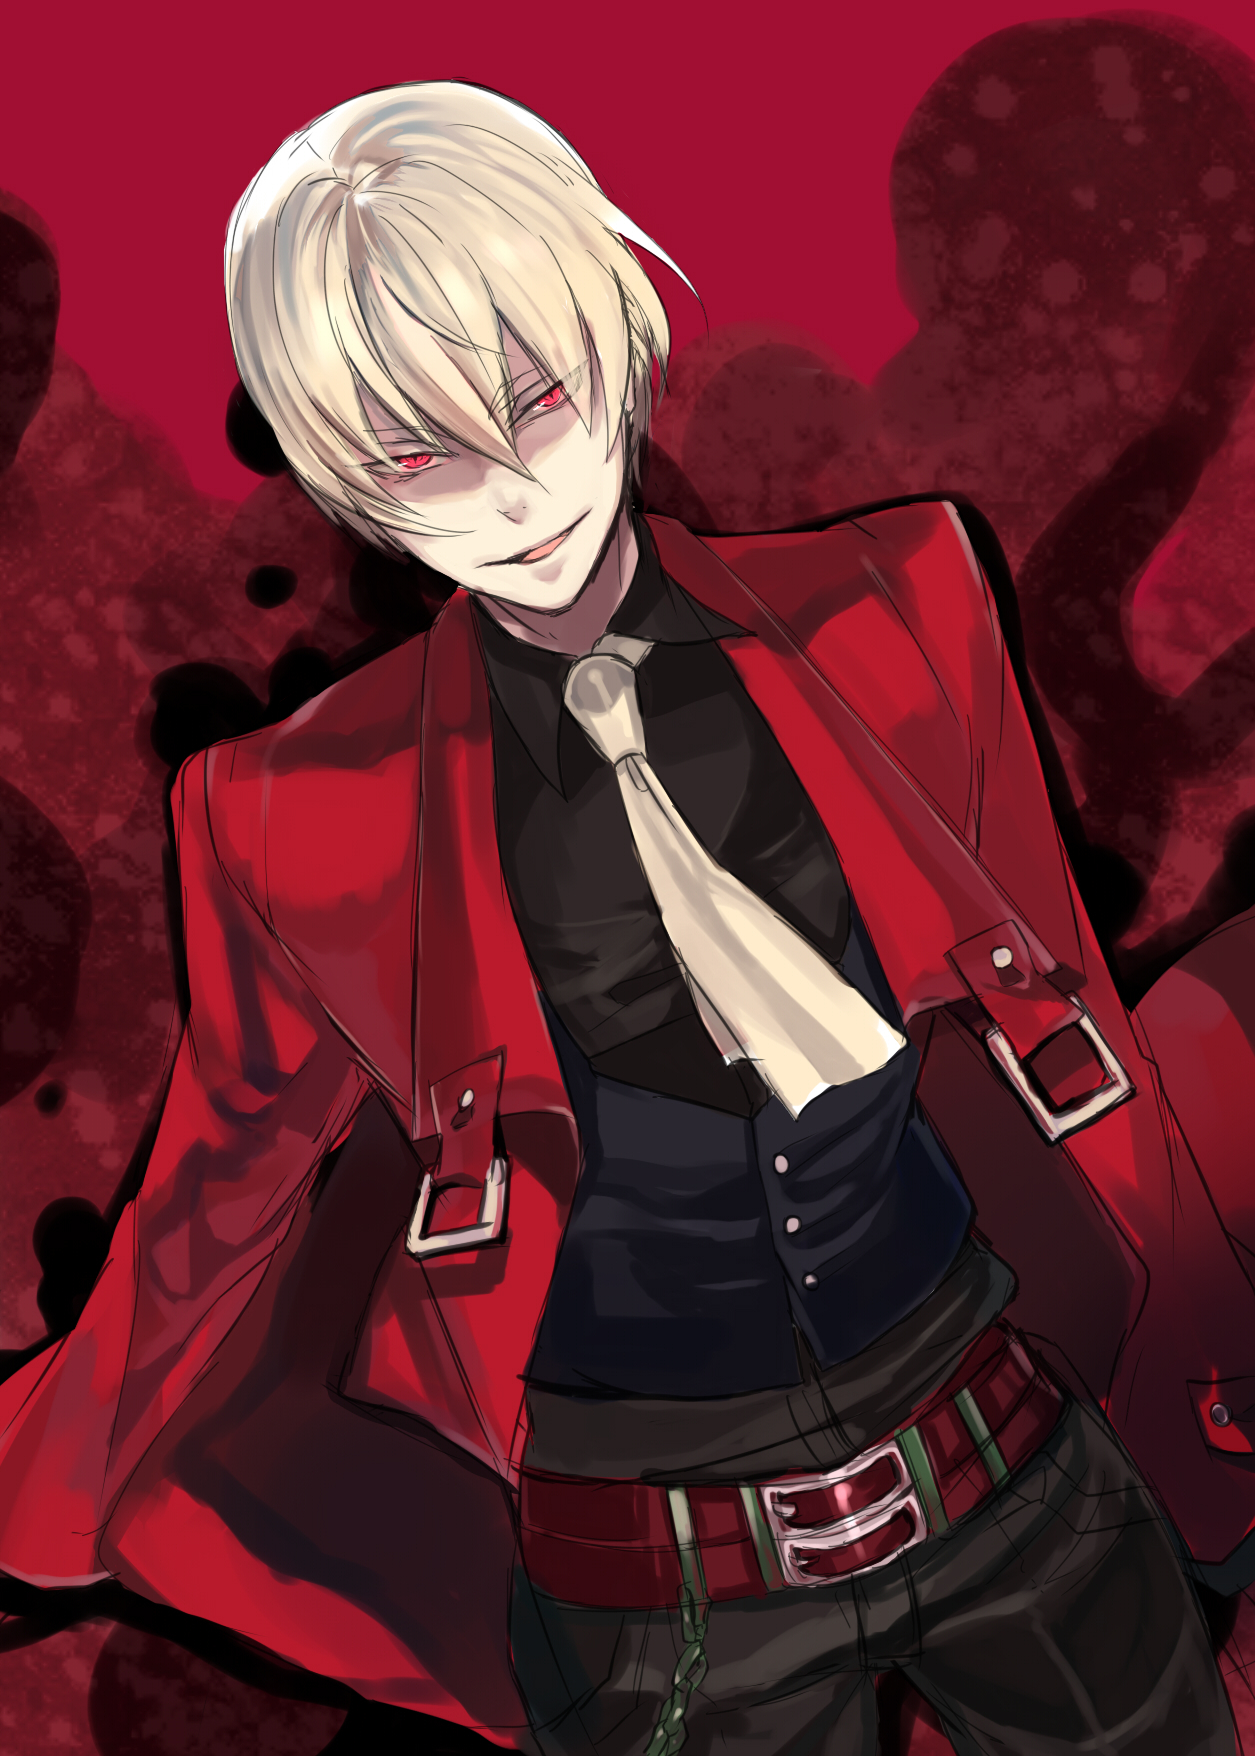 Blazblue zerochan anime image board for Zerochan anime